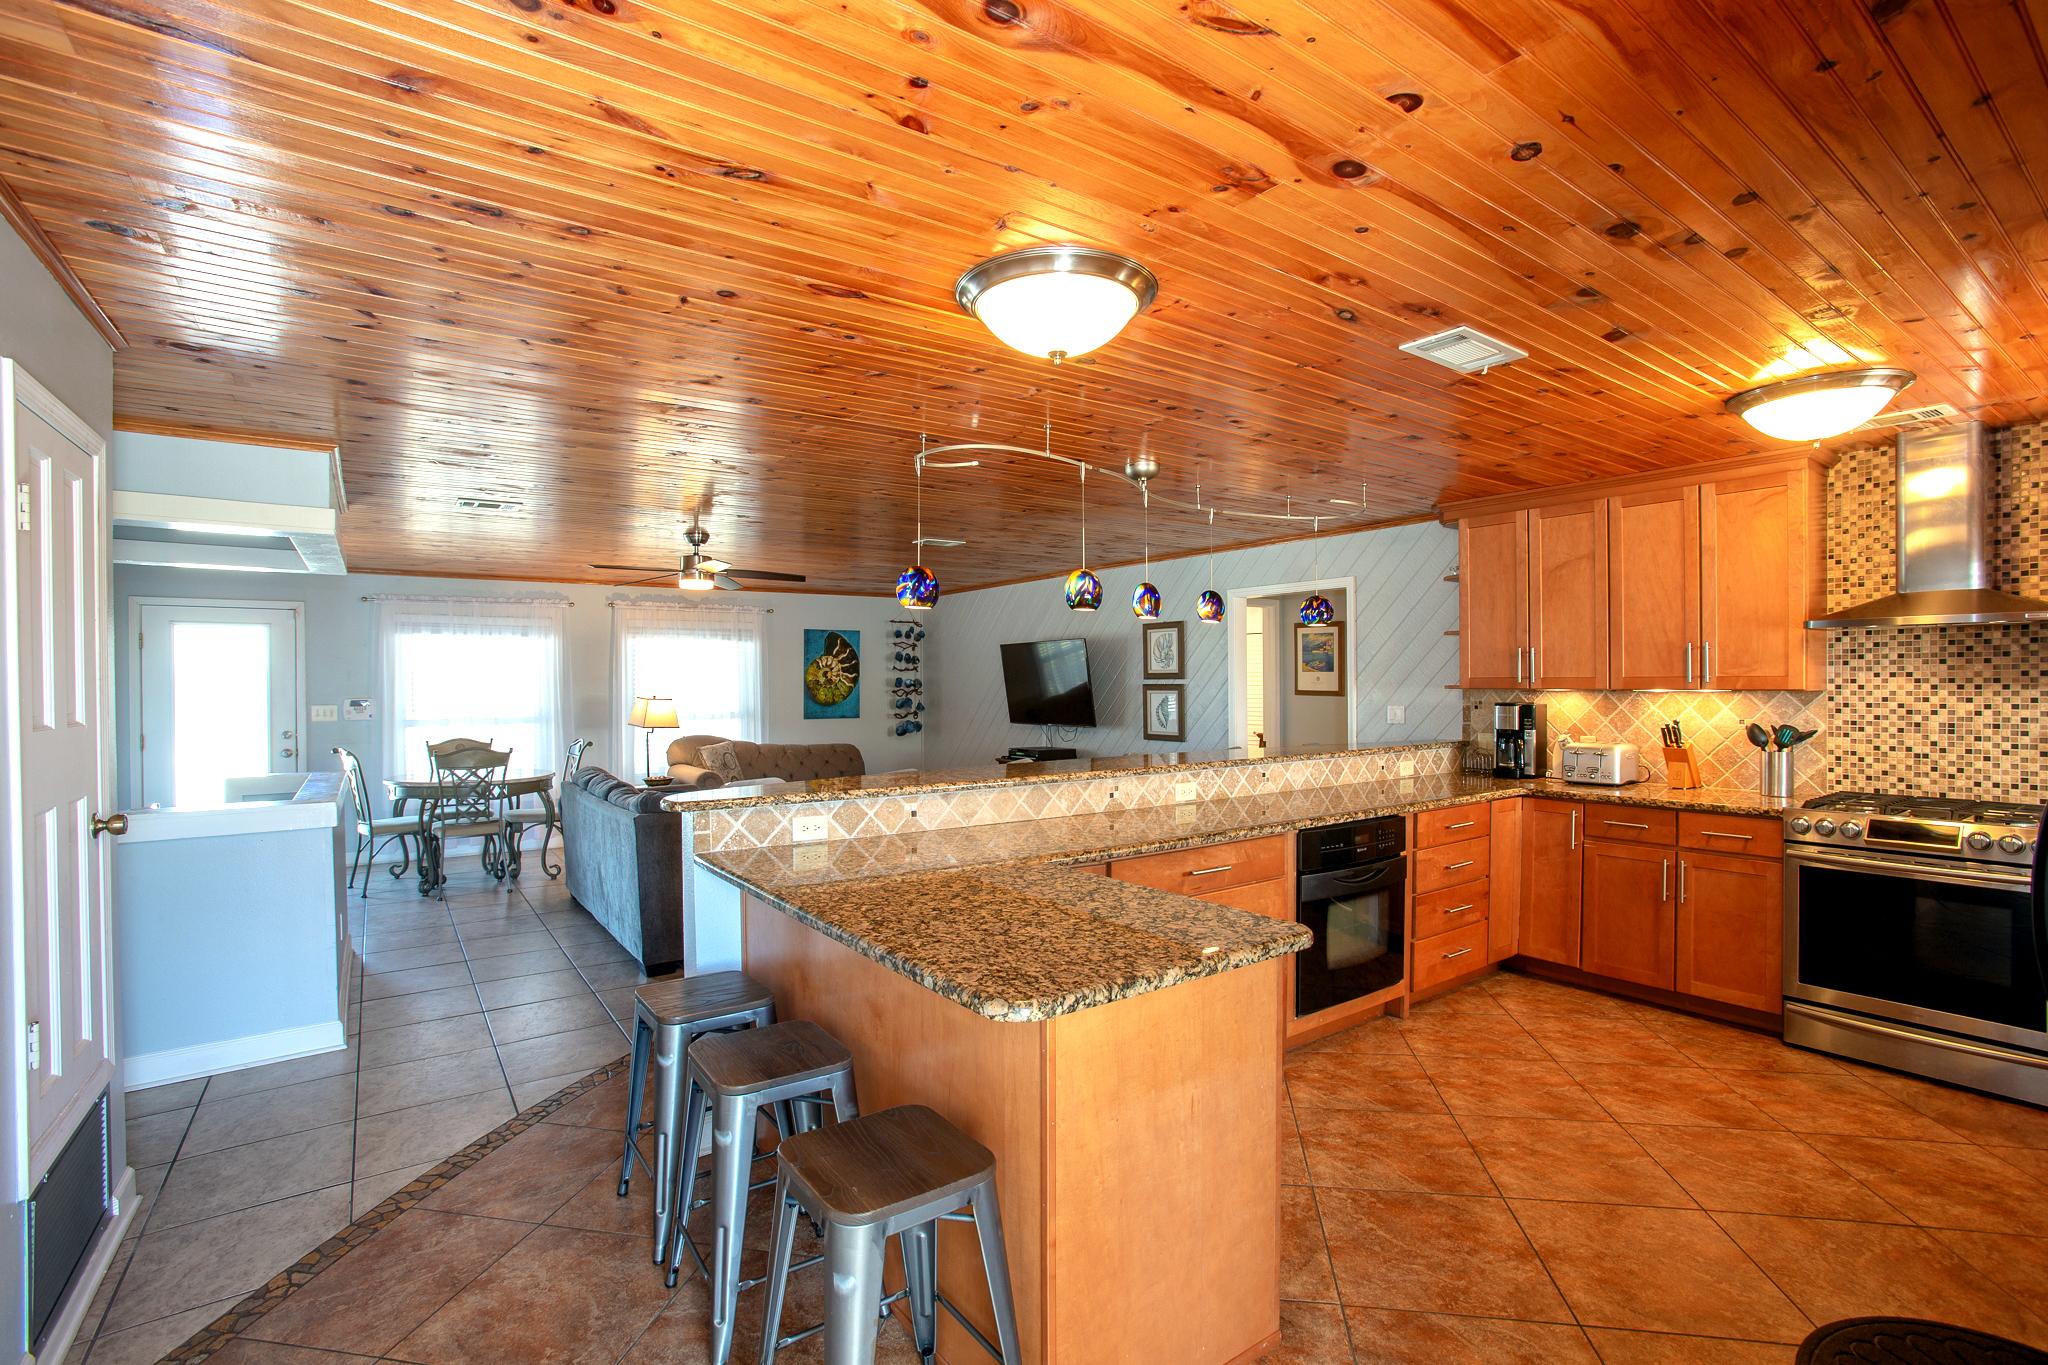 Maldonado 1015 - Sea the Big Picture House/Cottage rental in Pensacola Beach House Rentals in Pensacola Beach Florida - #8